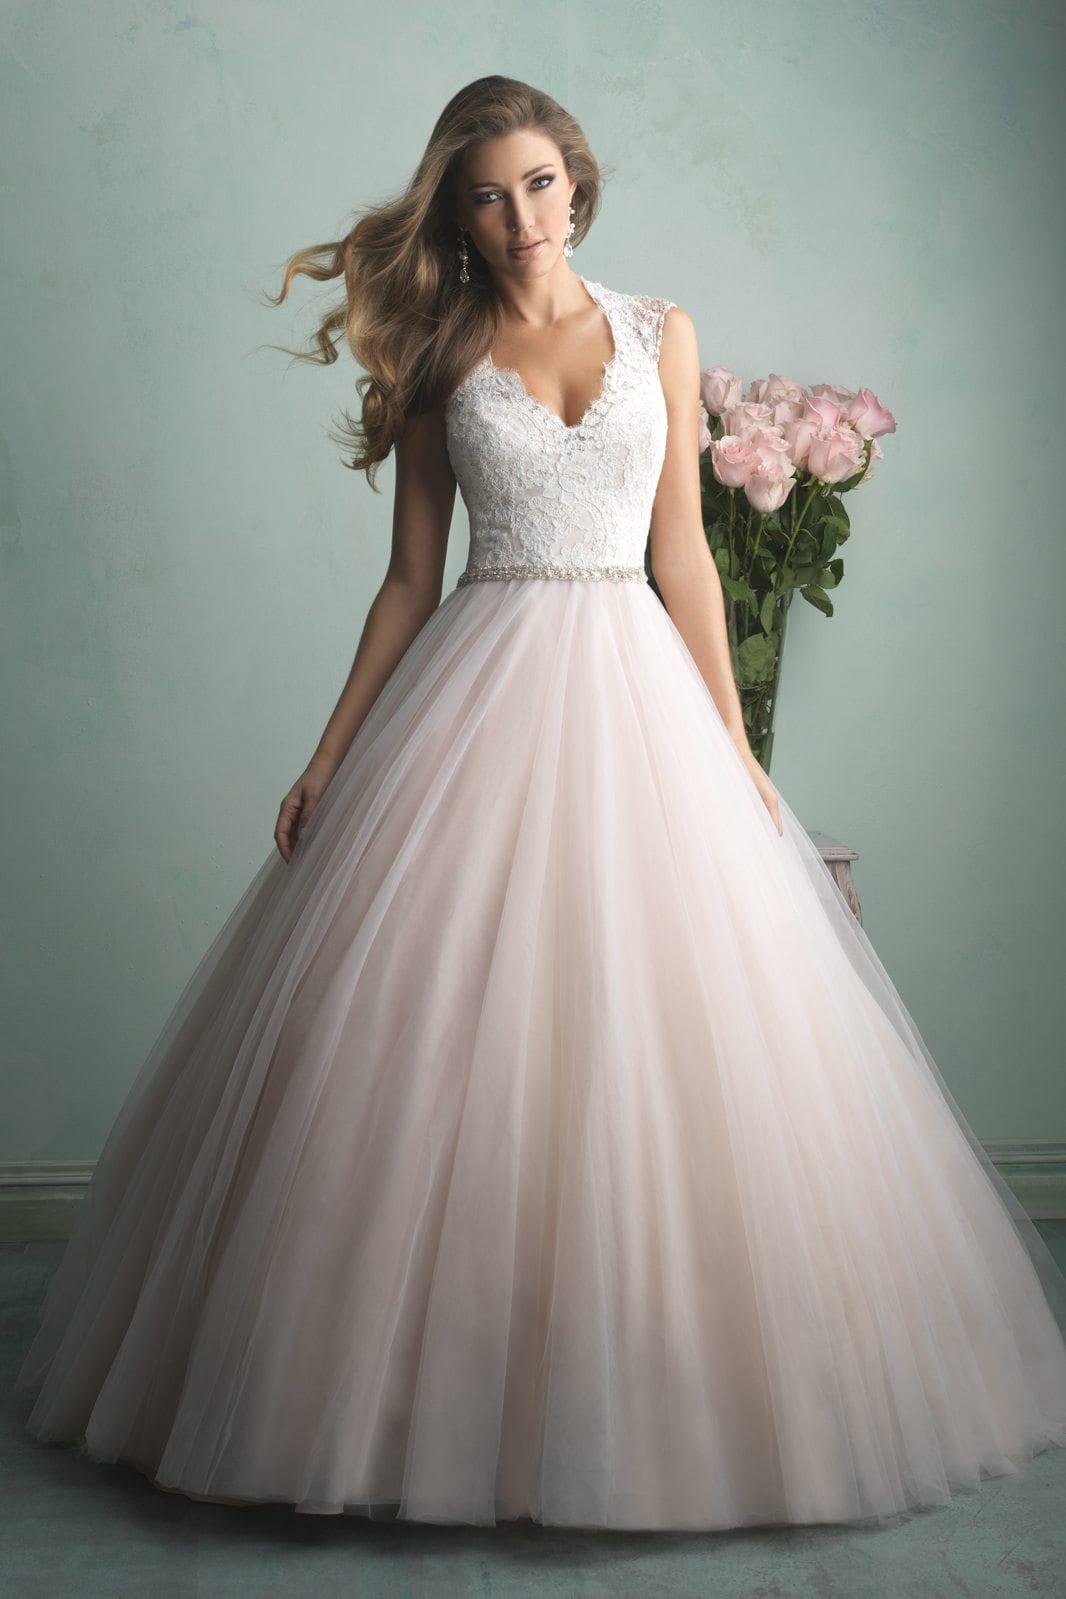 Allure Wedding Dresses for Sale